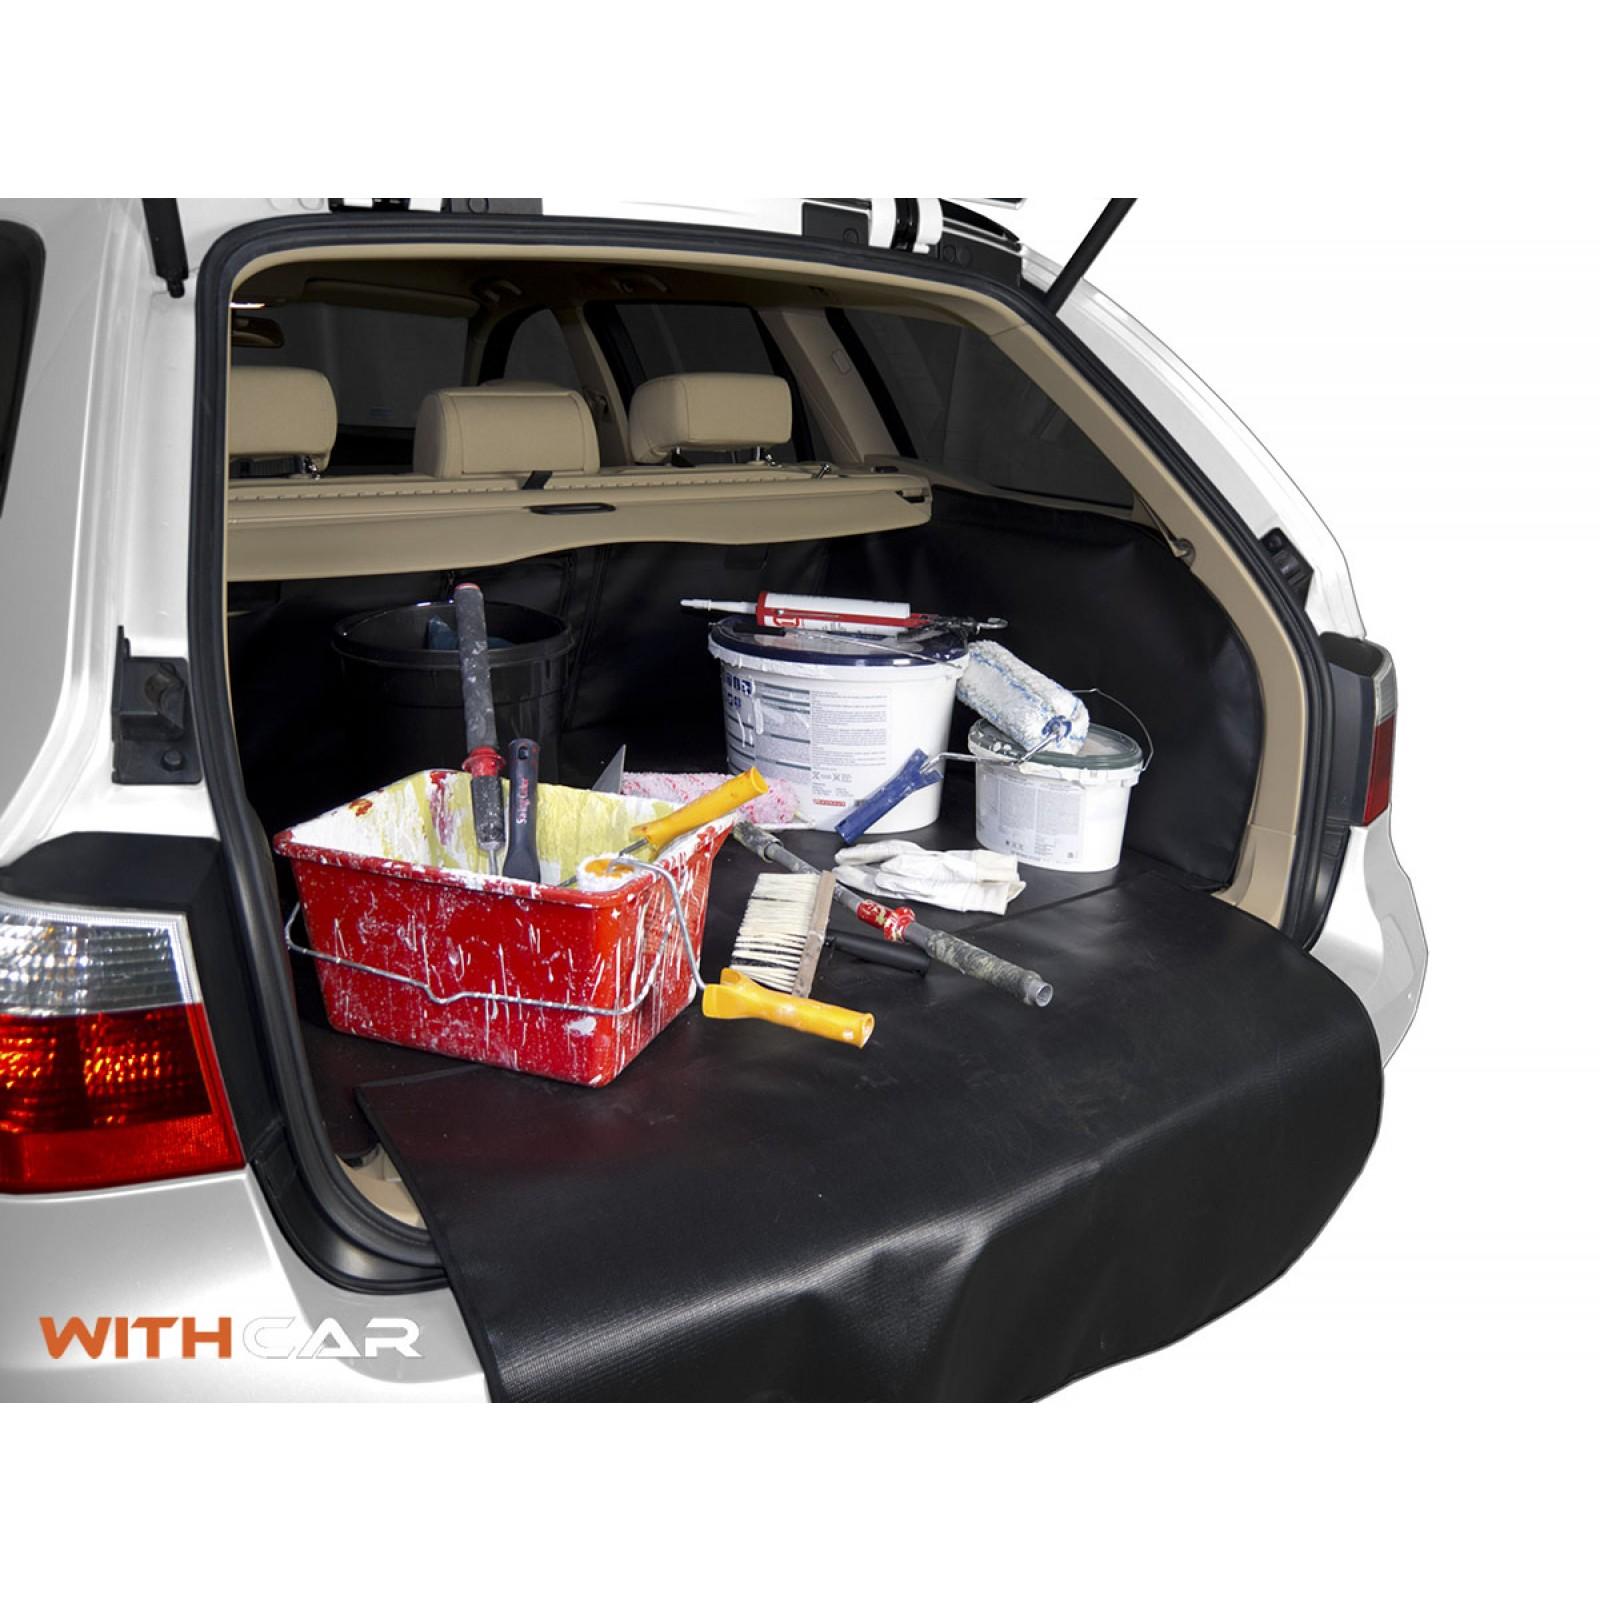 bootector vw touran 5 si ges volkswagen protection de coffre bootector offre sur mesure. Black Bedroom Furniture Sets. Home Design Ideas